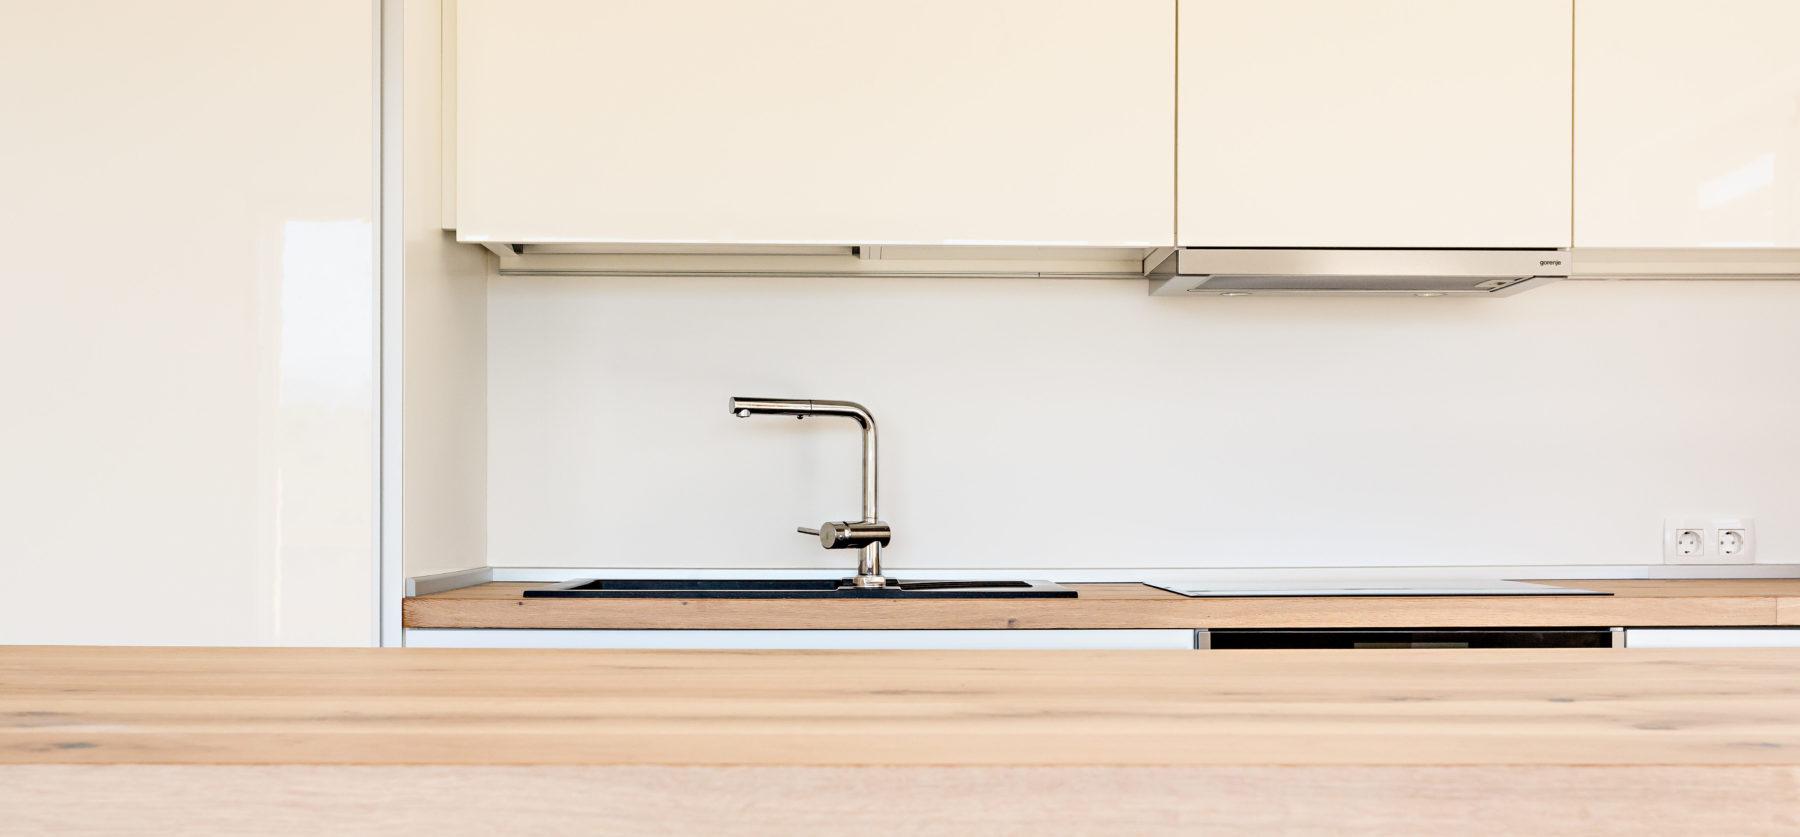 Mobilier & design bois